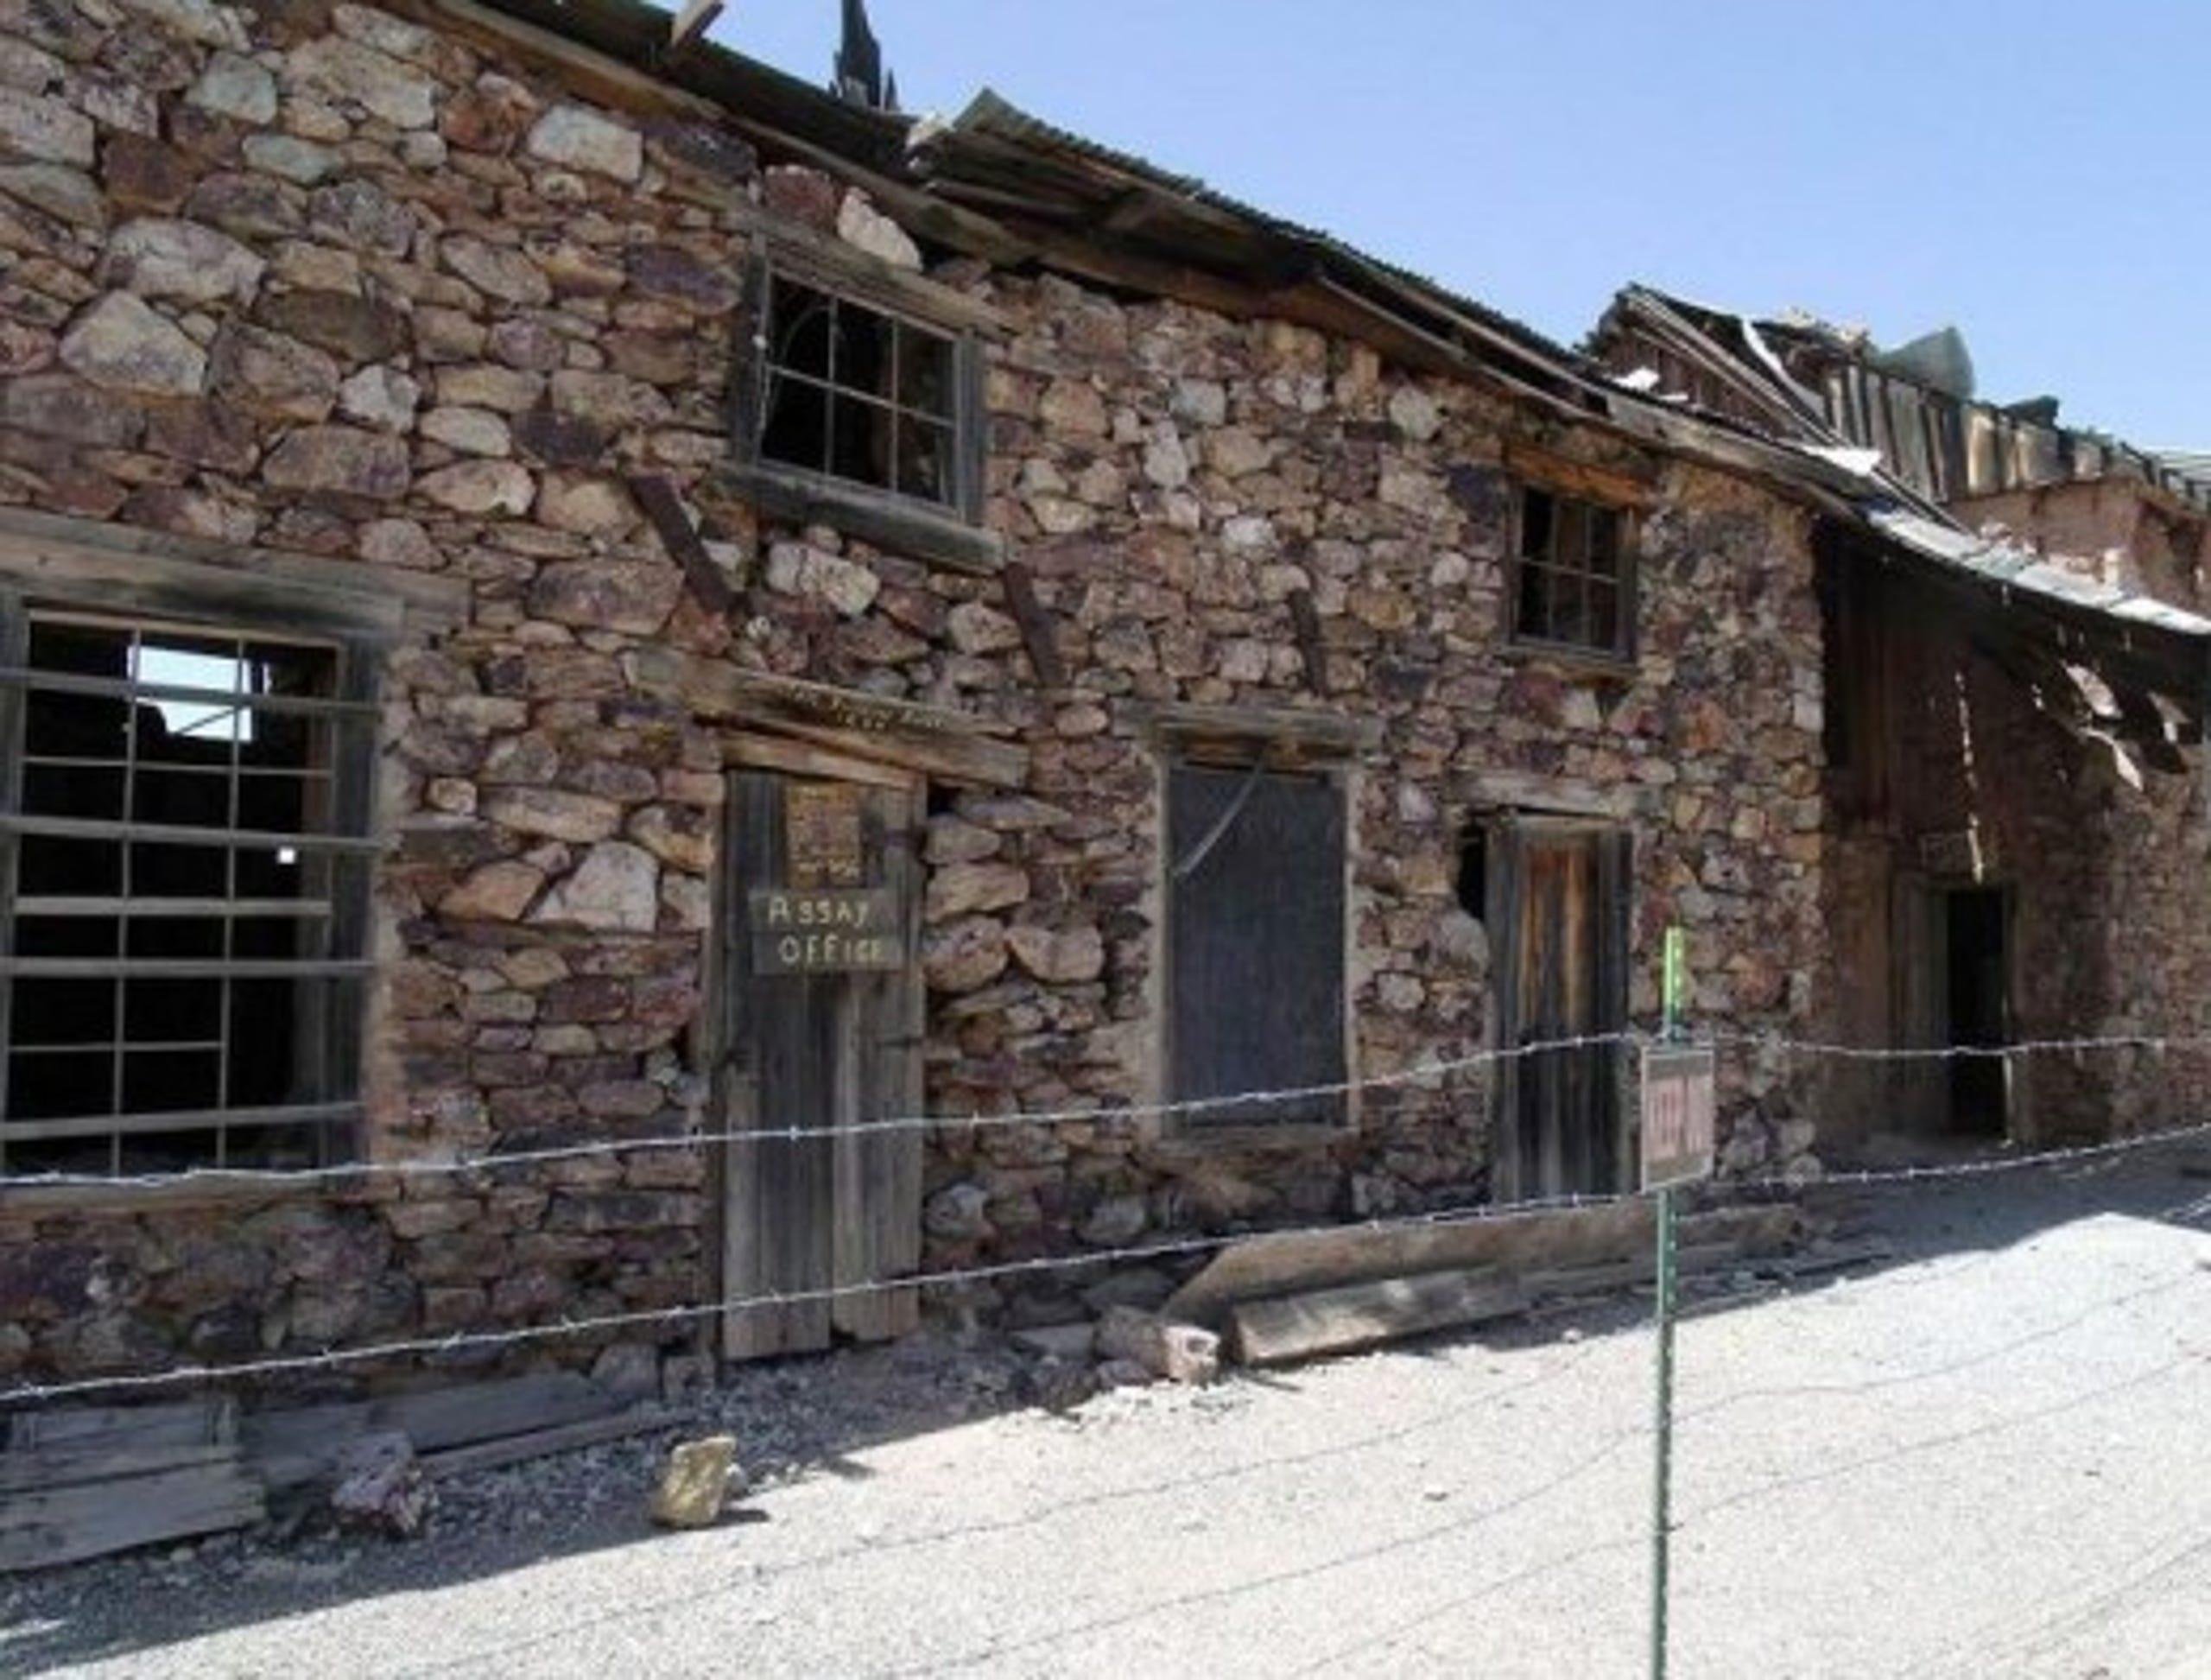 Vulture Mine assay office (1884)